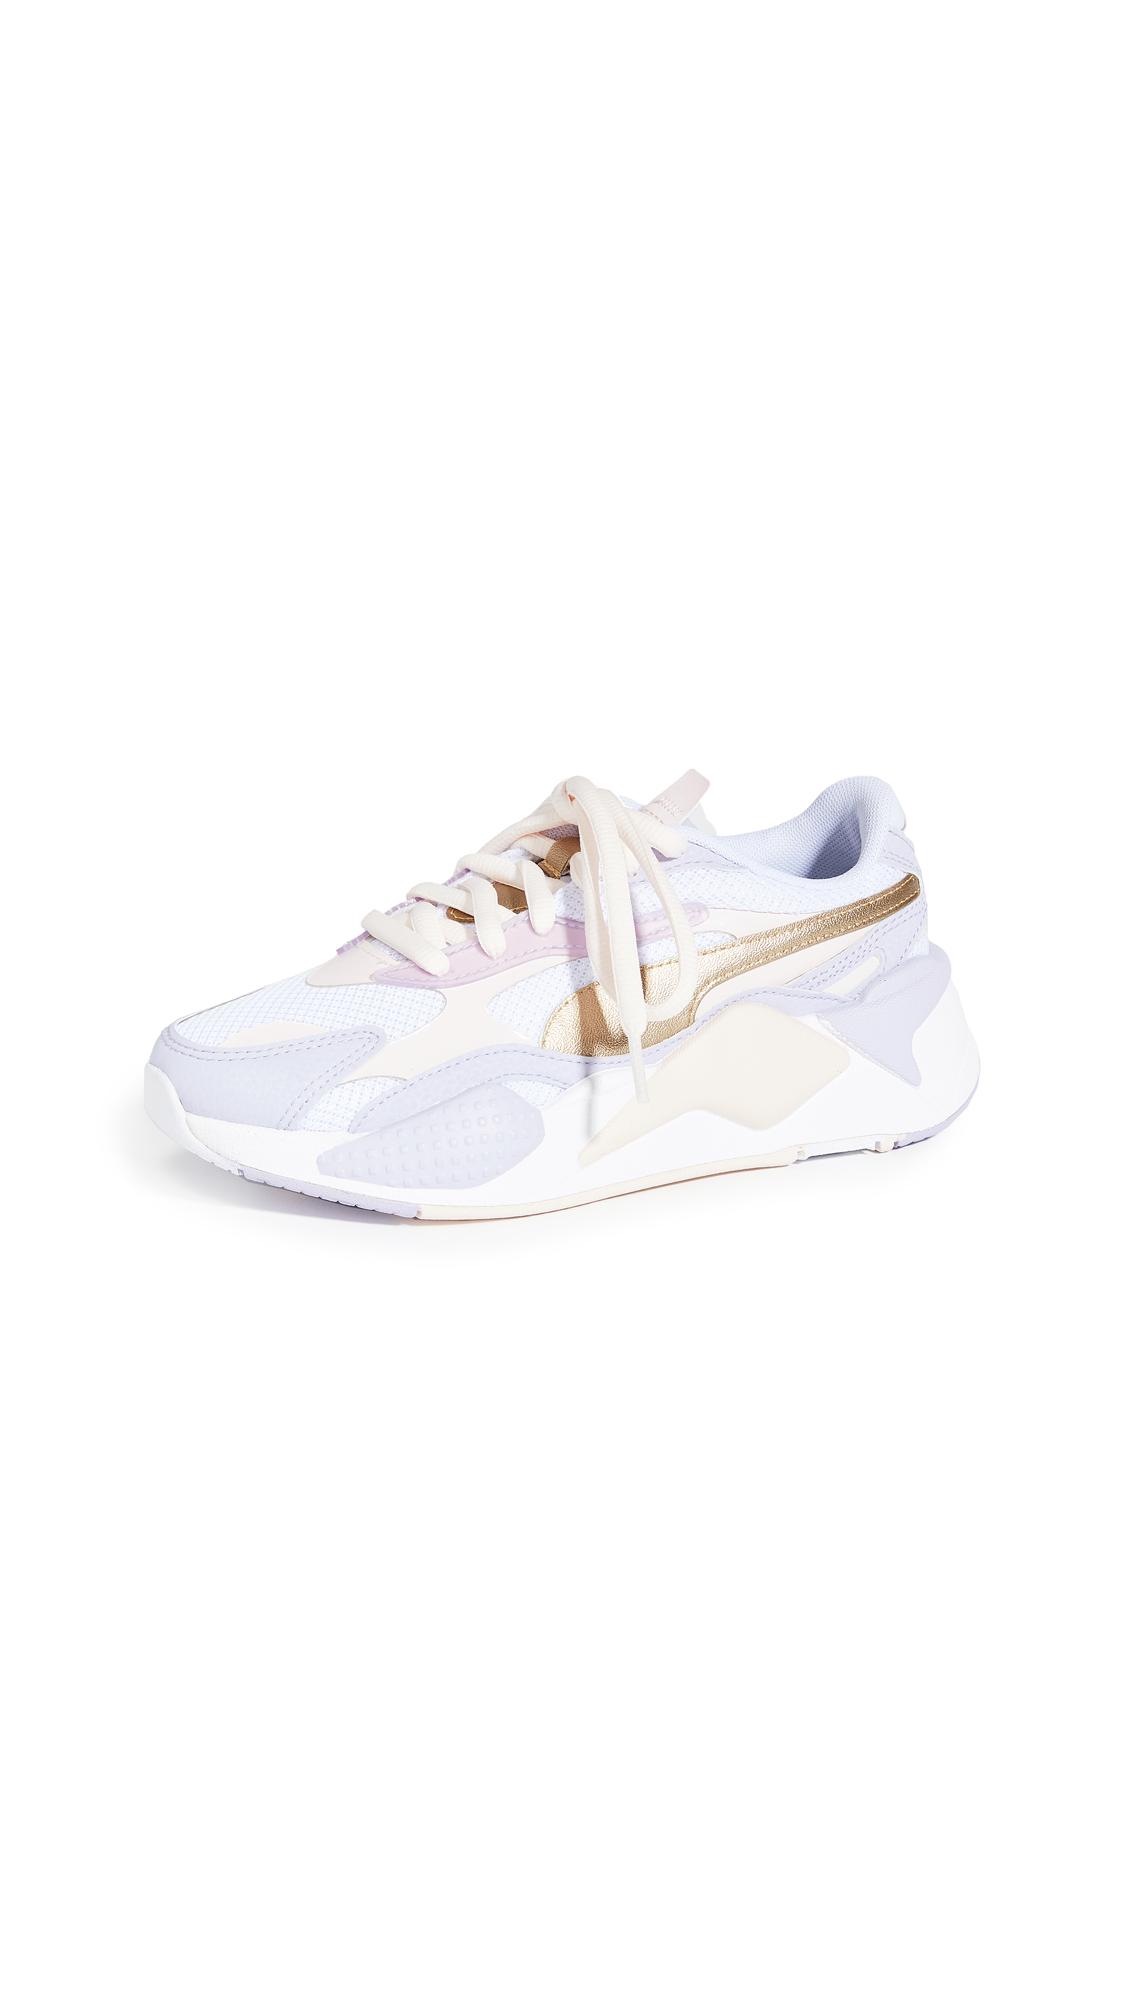 Buy PUMA RS-X3 C & S Sneakers online, shop PUMA